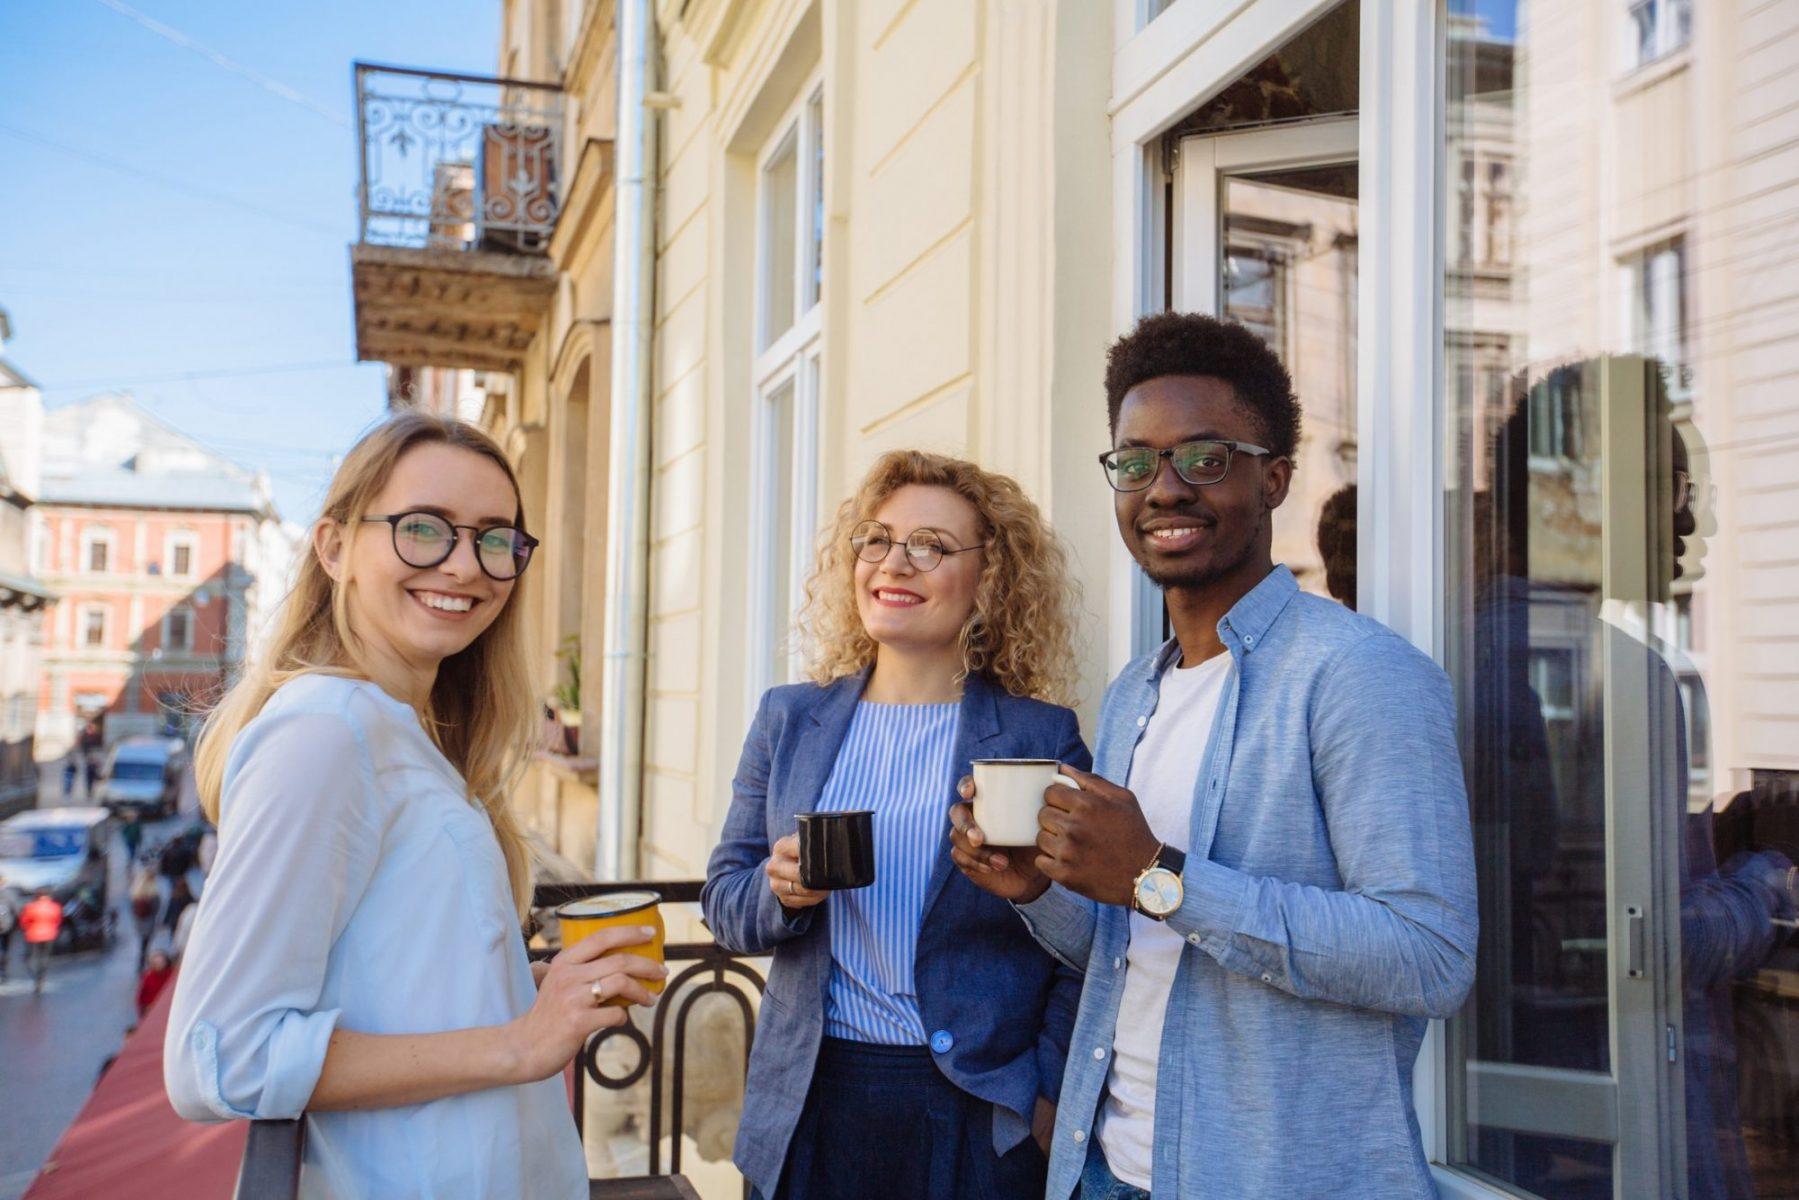 Northwest Arkansas Employee Benefit | Office Coffee Services | Corporate Wellness Program | Eco-Friendly Practices